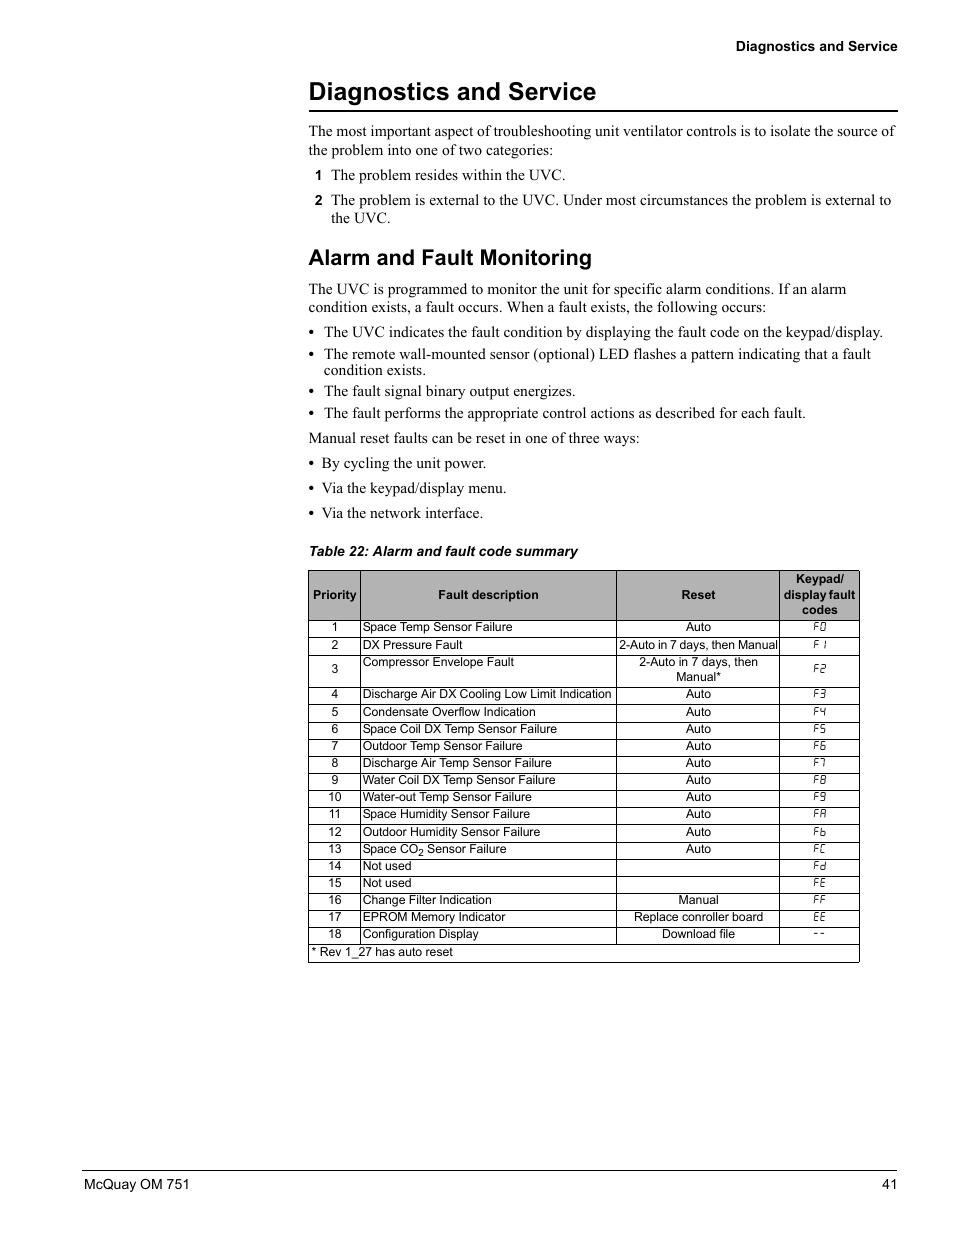 diagnostics and service alarm and fault monitoring american rh manualsdir com american standard ac user manual american standard toilet user manual